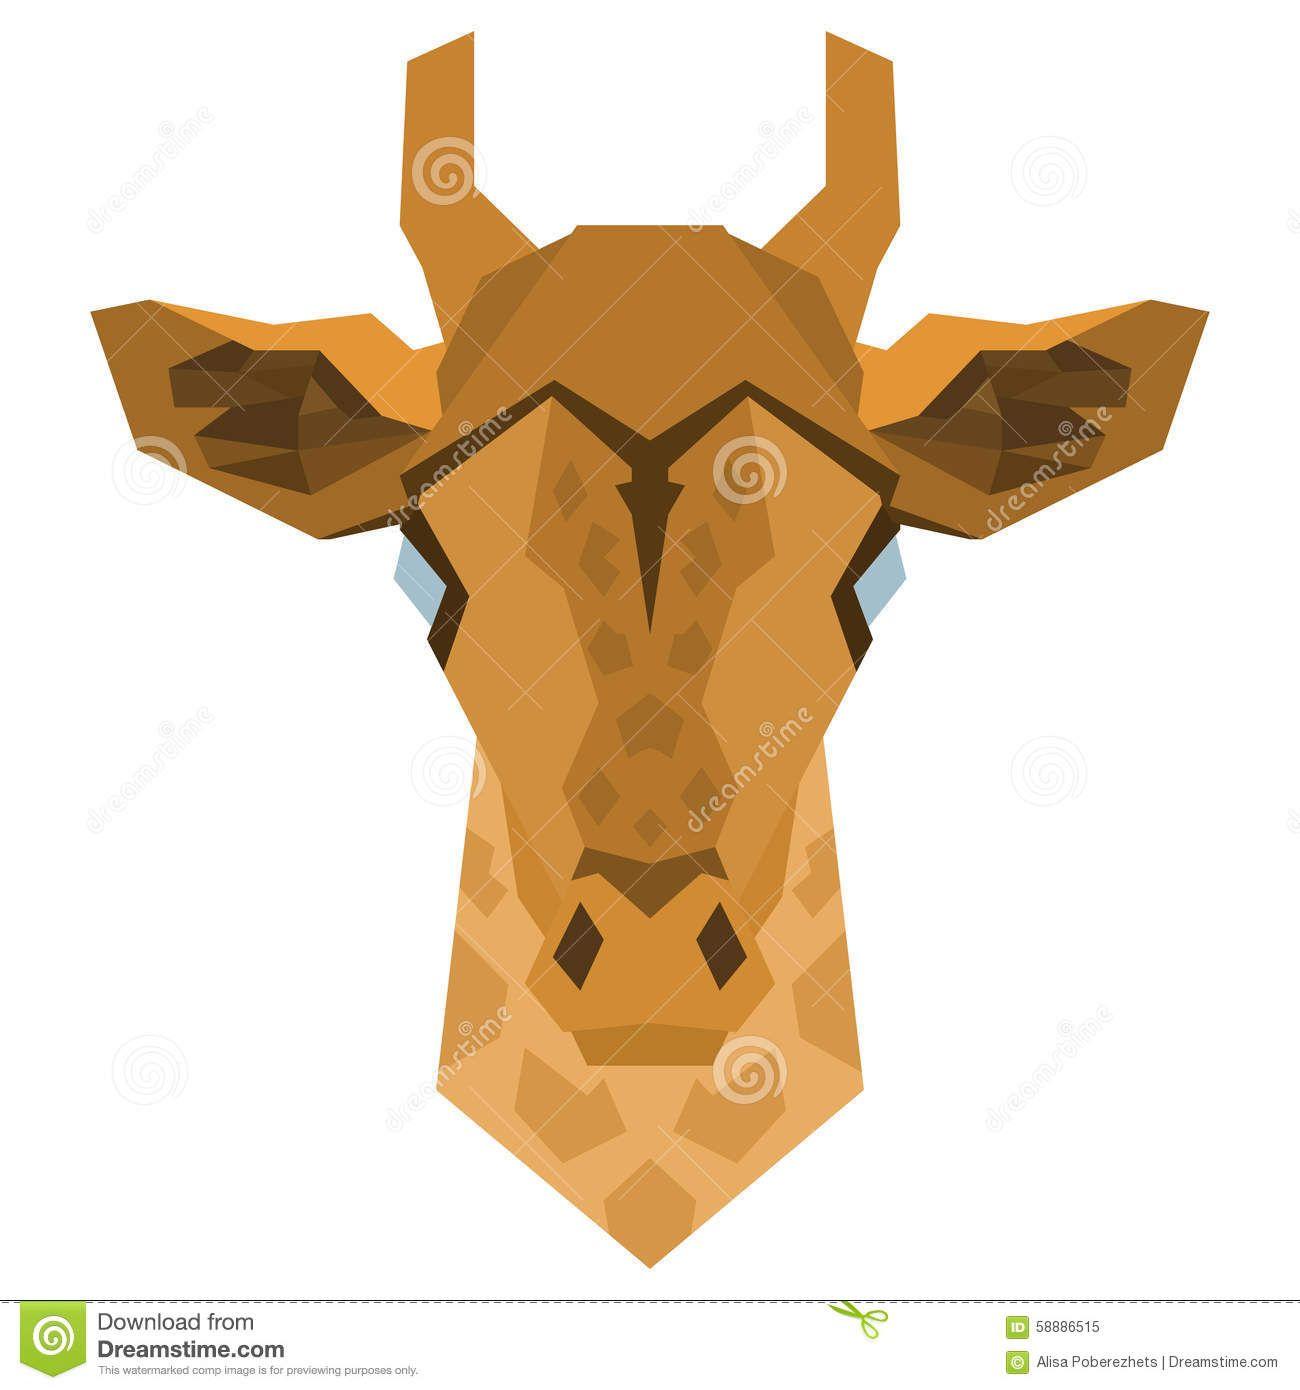 geometric giraffe sketch - Google Search